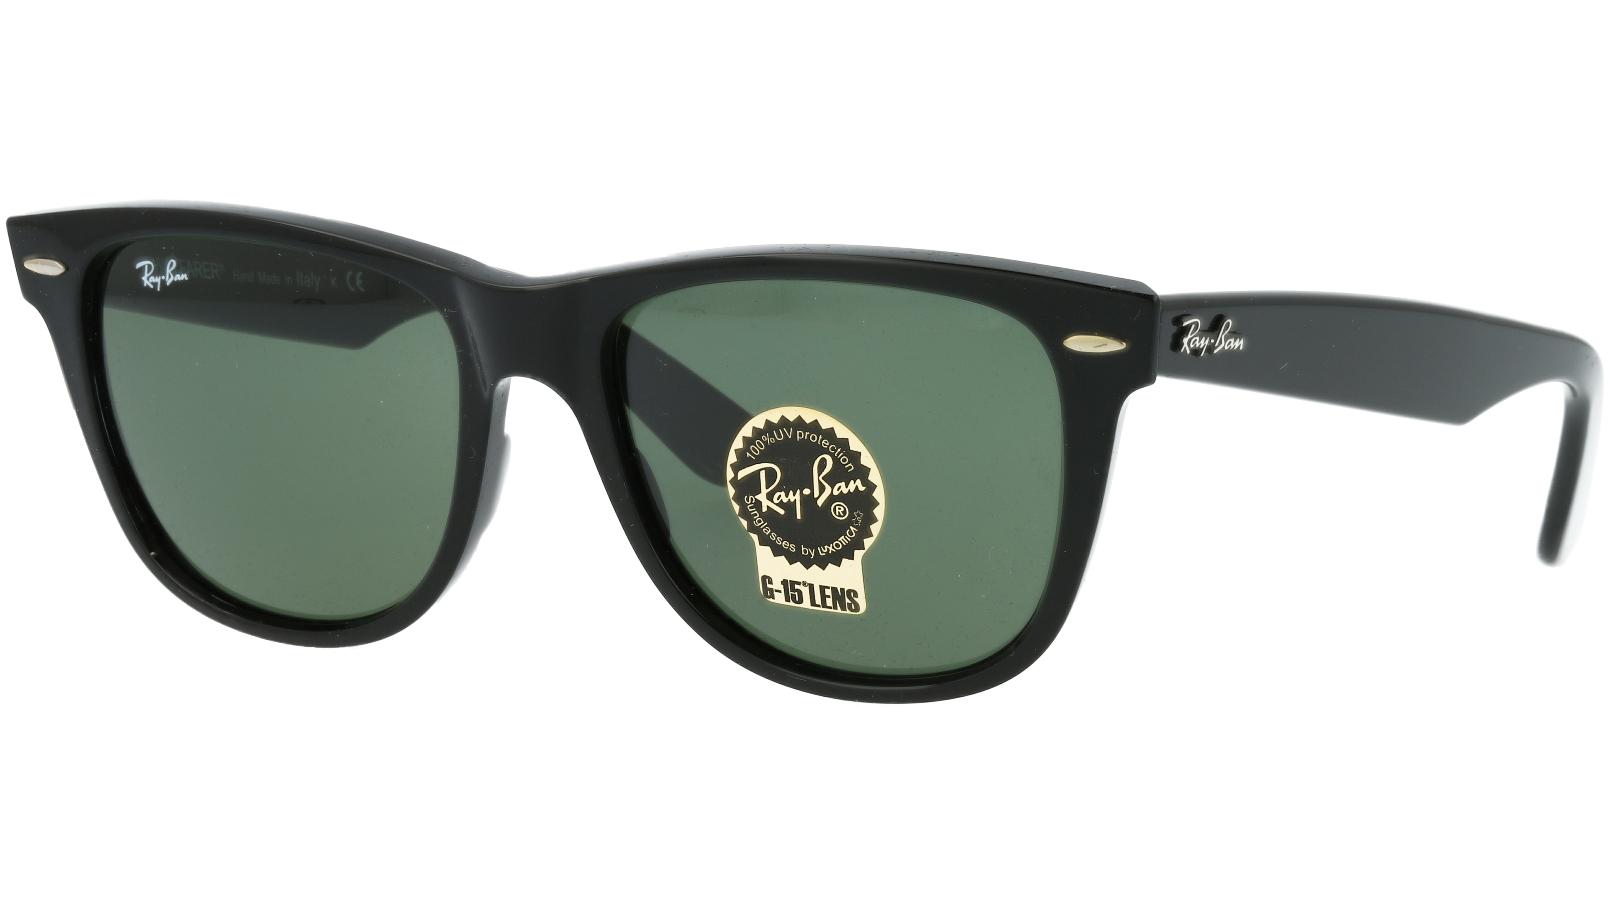 Ray-Ban RB2140 901 54 Black Sunglasses